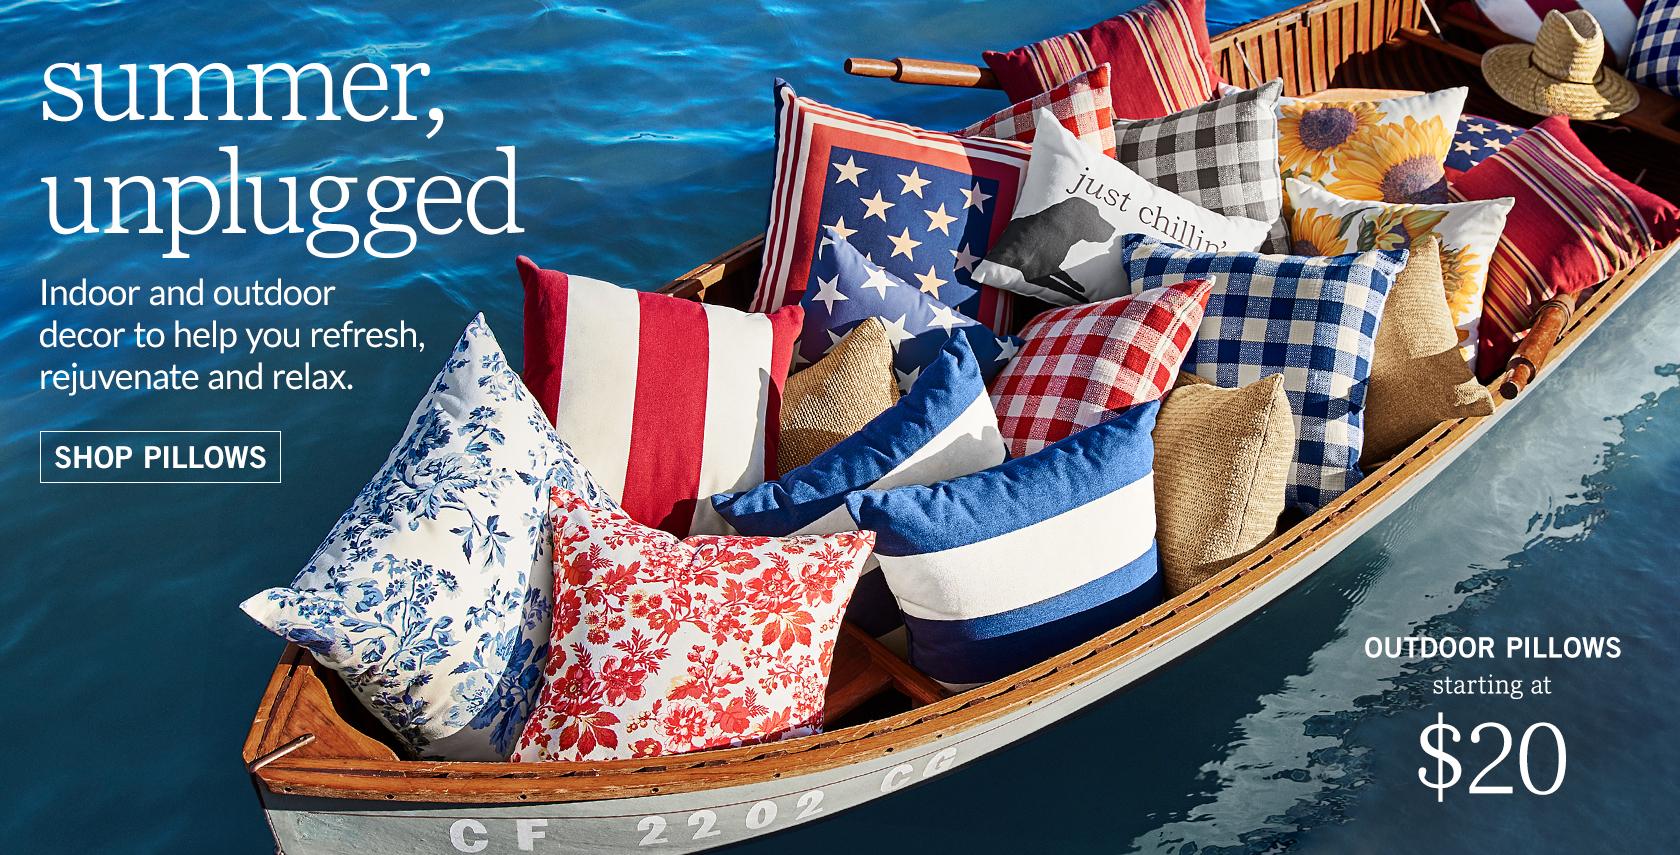 Outdoor Decor Company Home Furnishings Home Decor Outdoor Furniture Modern Furniture